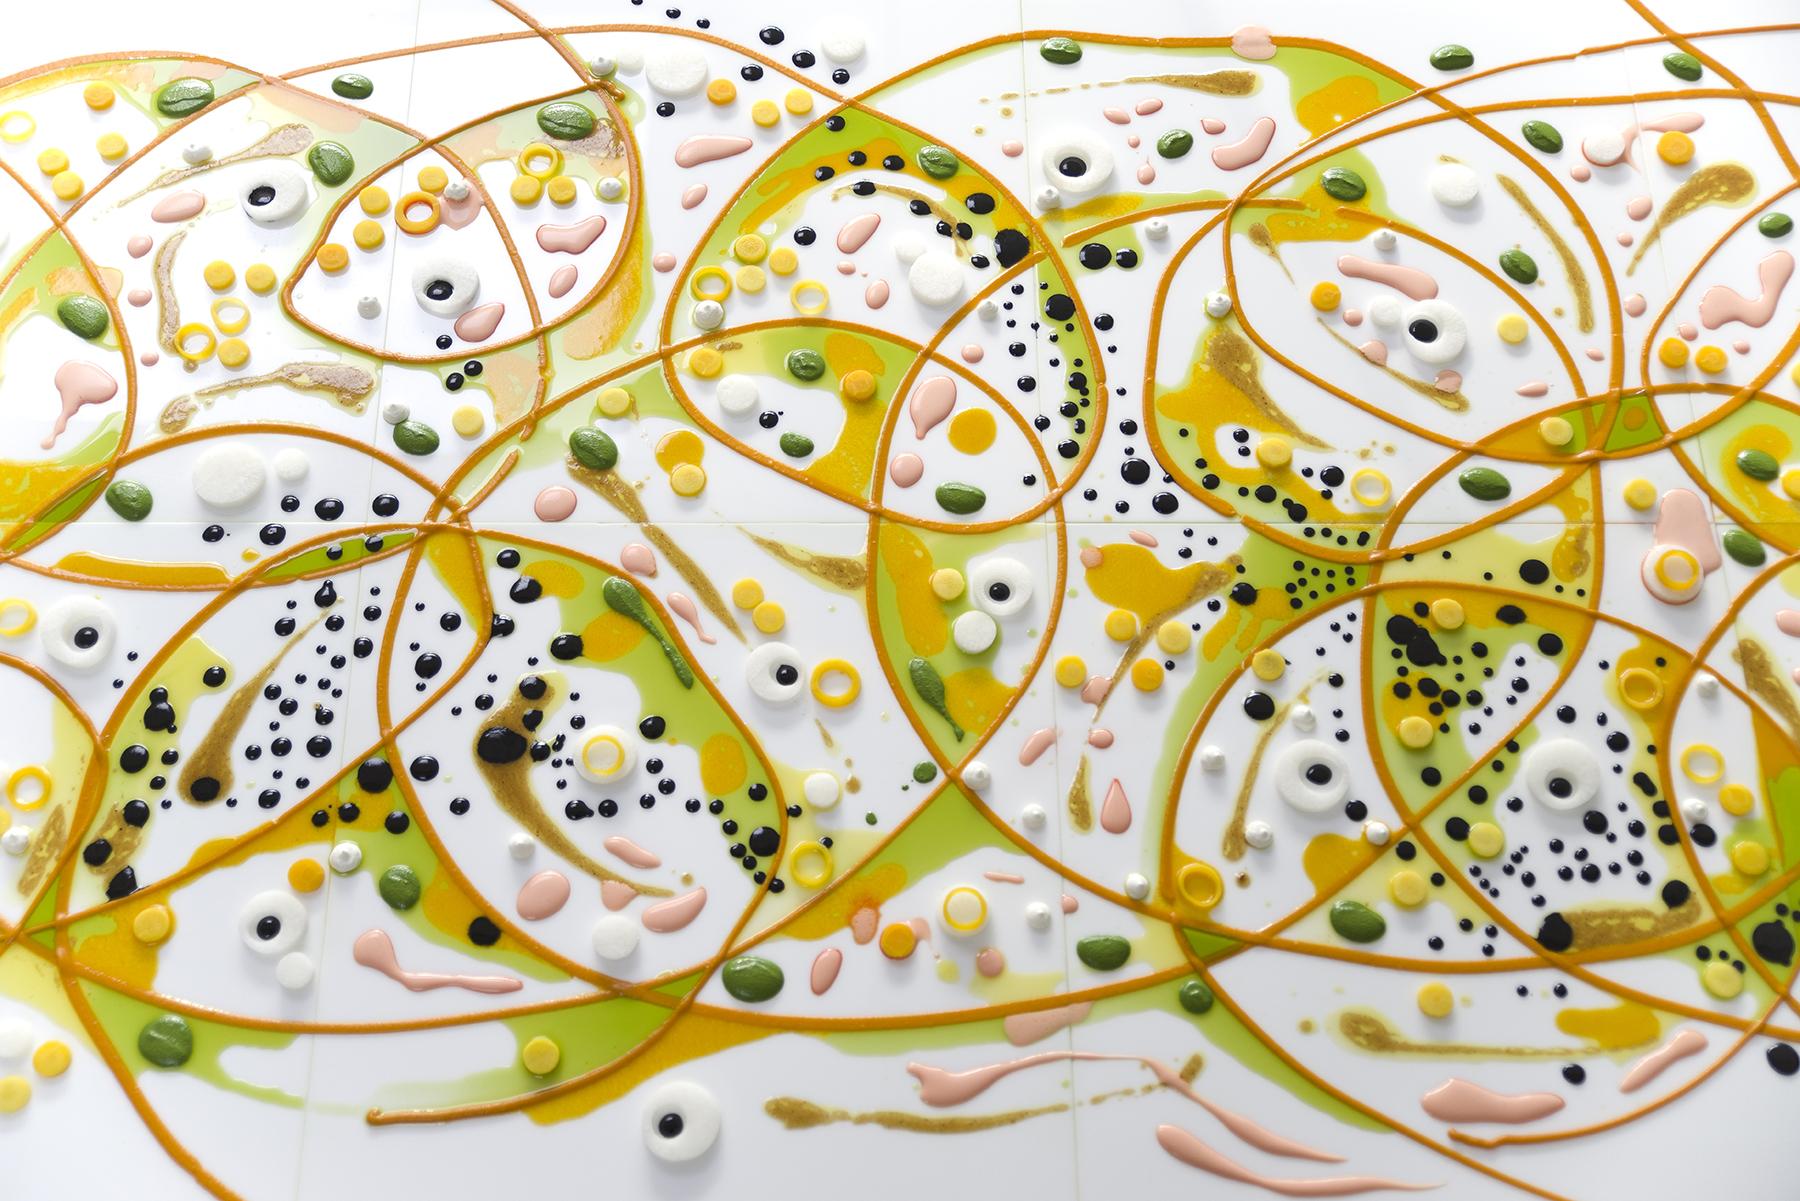 EETSCHILDERIJ-Flavour painting-A.Schmeinck_FHV9226.jpg